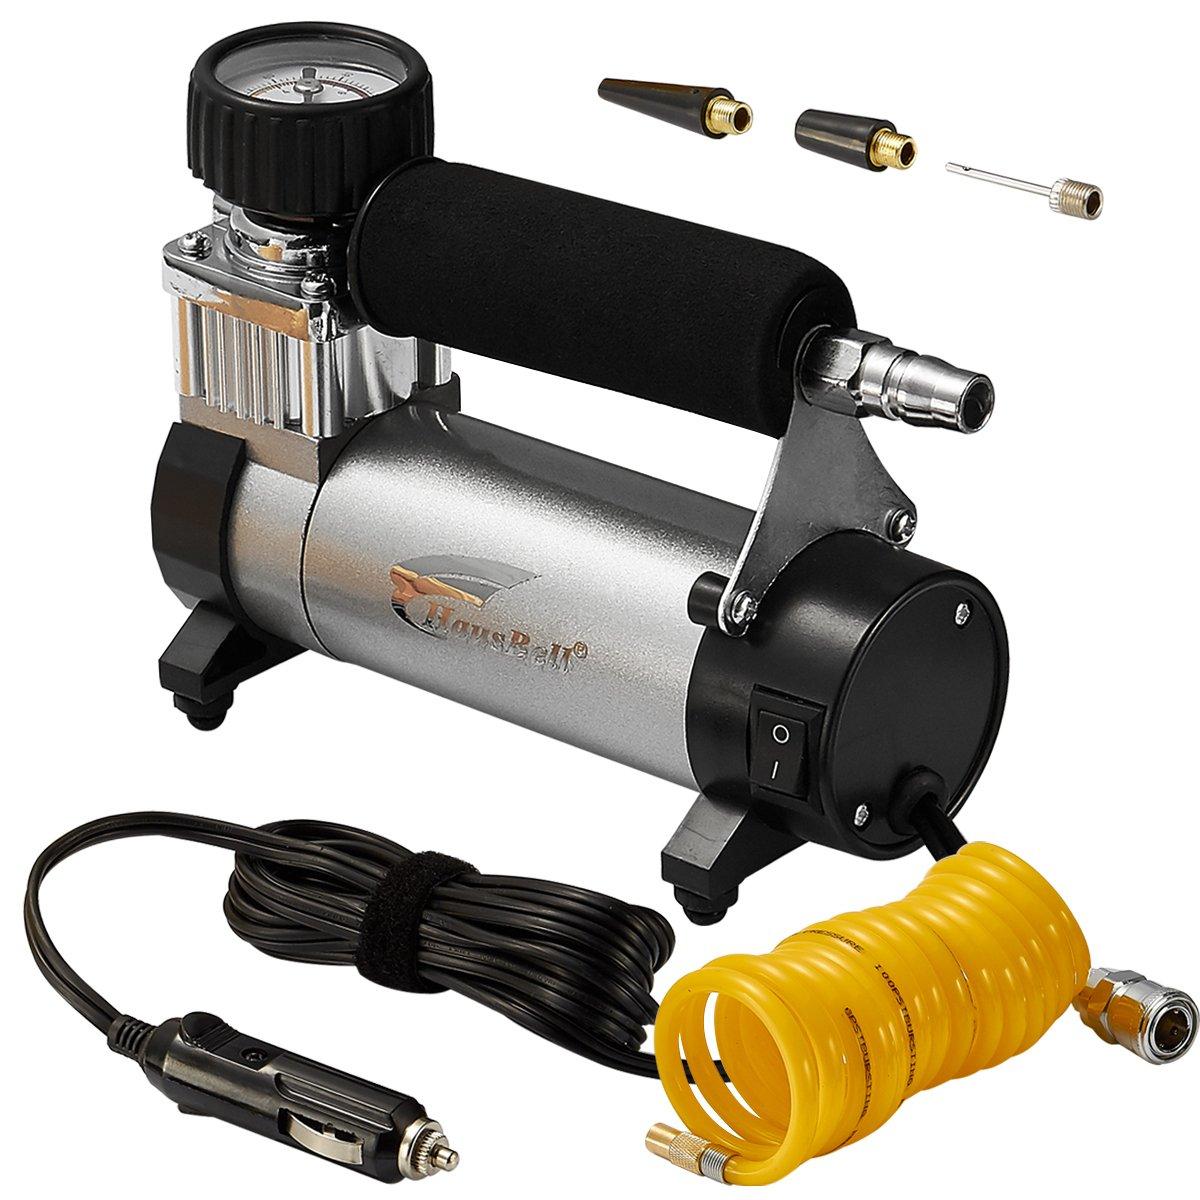 Portable Air Compressor, Hausbell Air Compressor Kit Mini DC12V Multi-Use Oil-Free Air Tools Tire Inflator FBA_Hausbell 3035